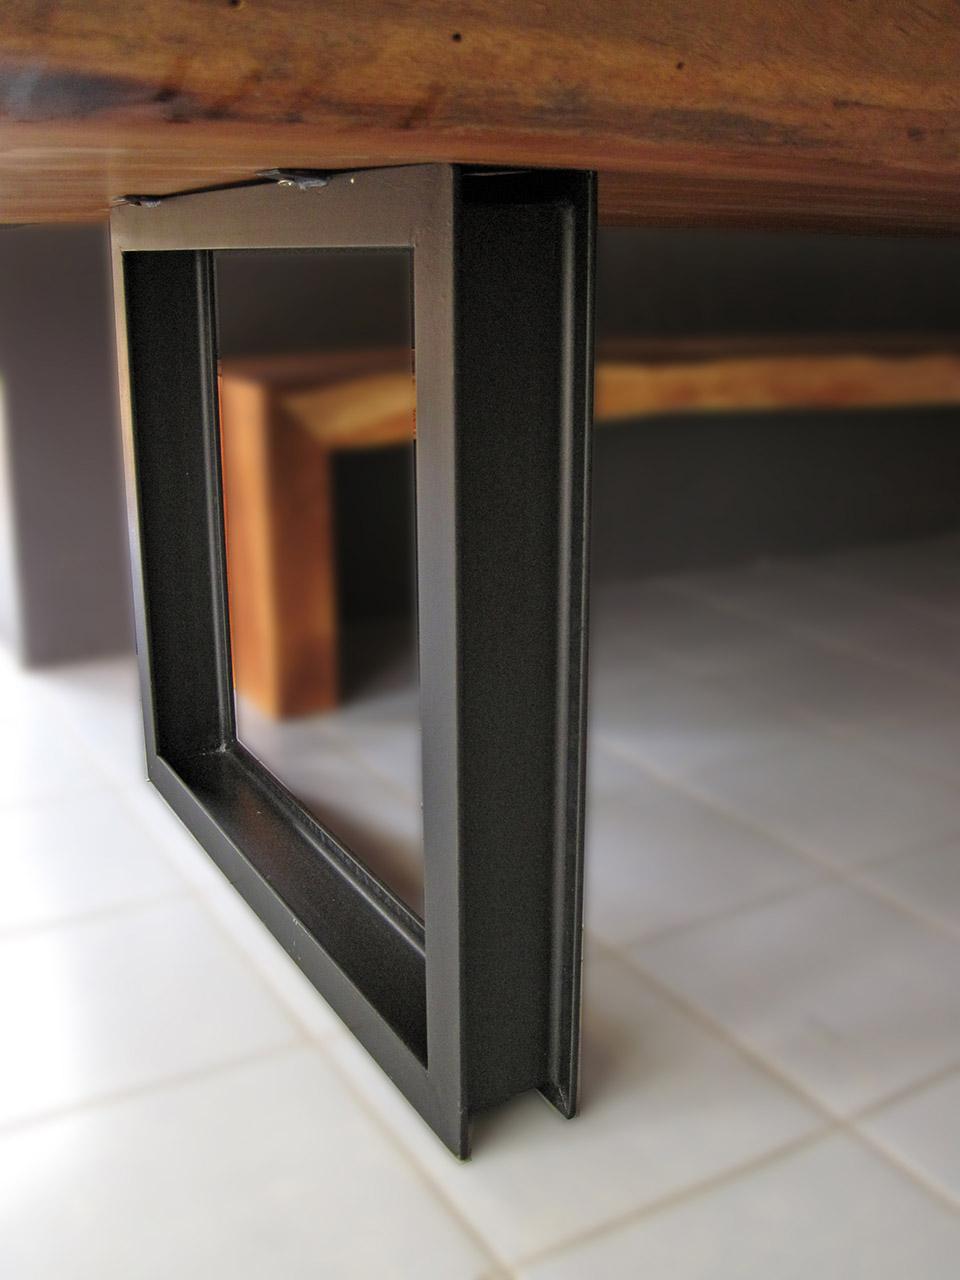 tischbeine andere ideen massivholztischemassivholztische. Black Bedroom Furniture Sets. Home Design Ideas